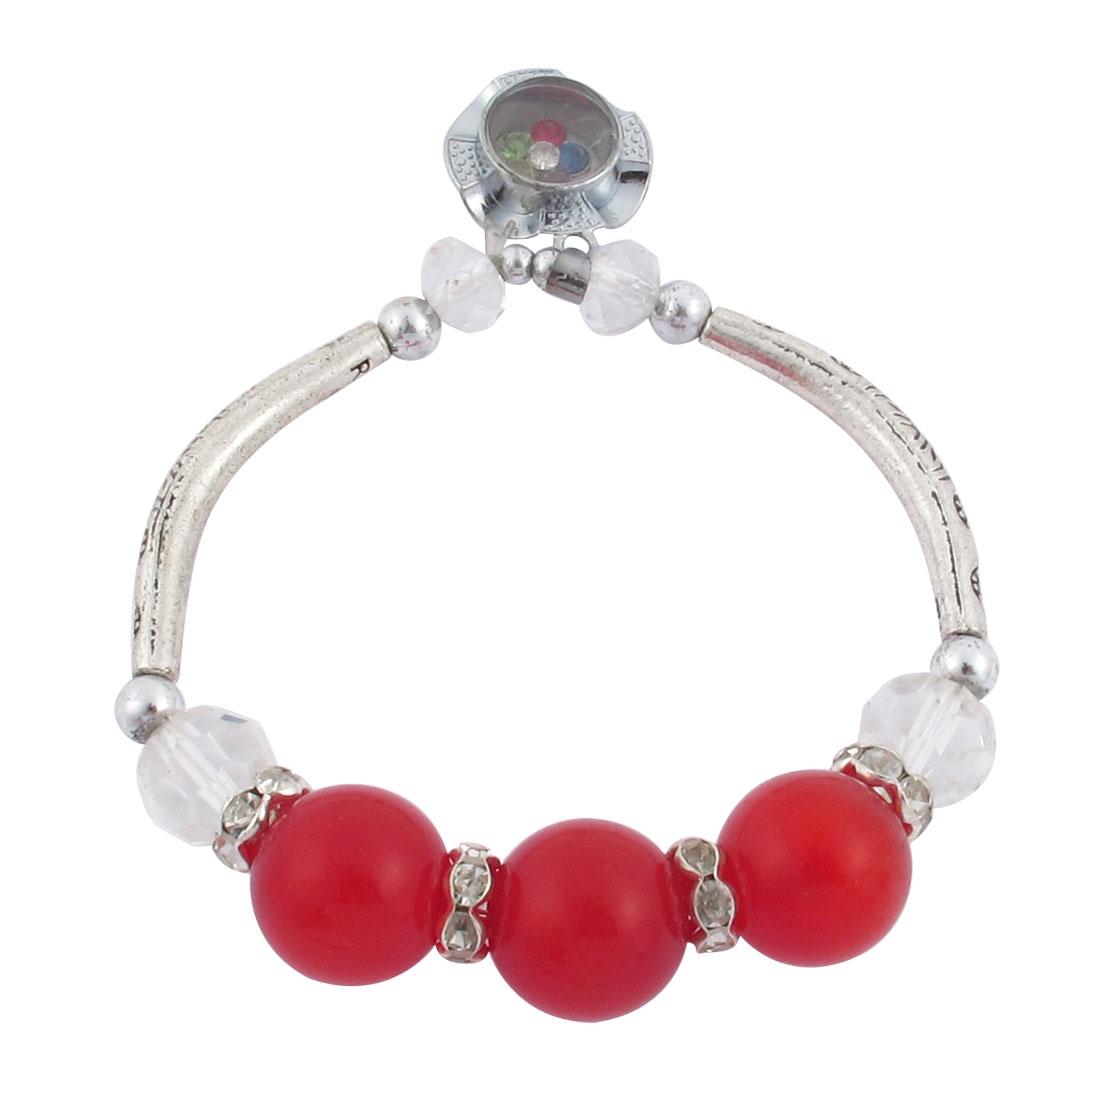 Lady Red Faux Cat Eyes Stone Accent Rhinestone Inlaid Pendant Elastic Wrist Bracelet